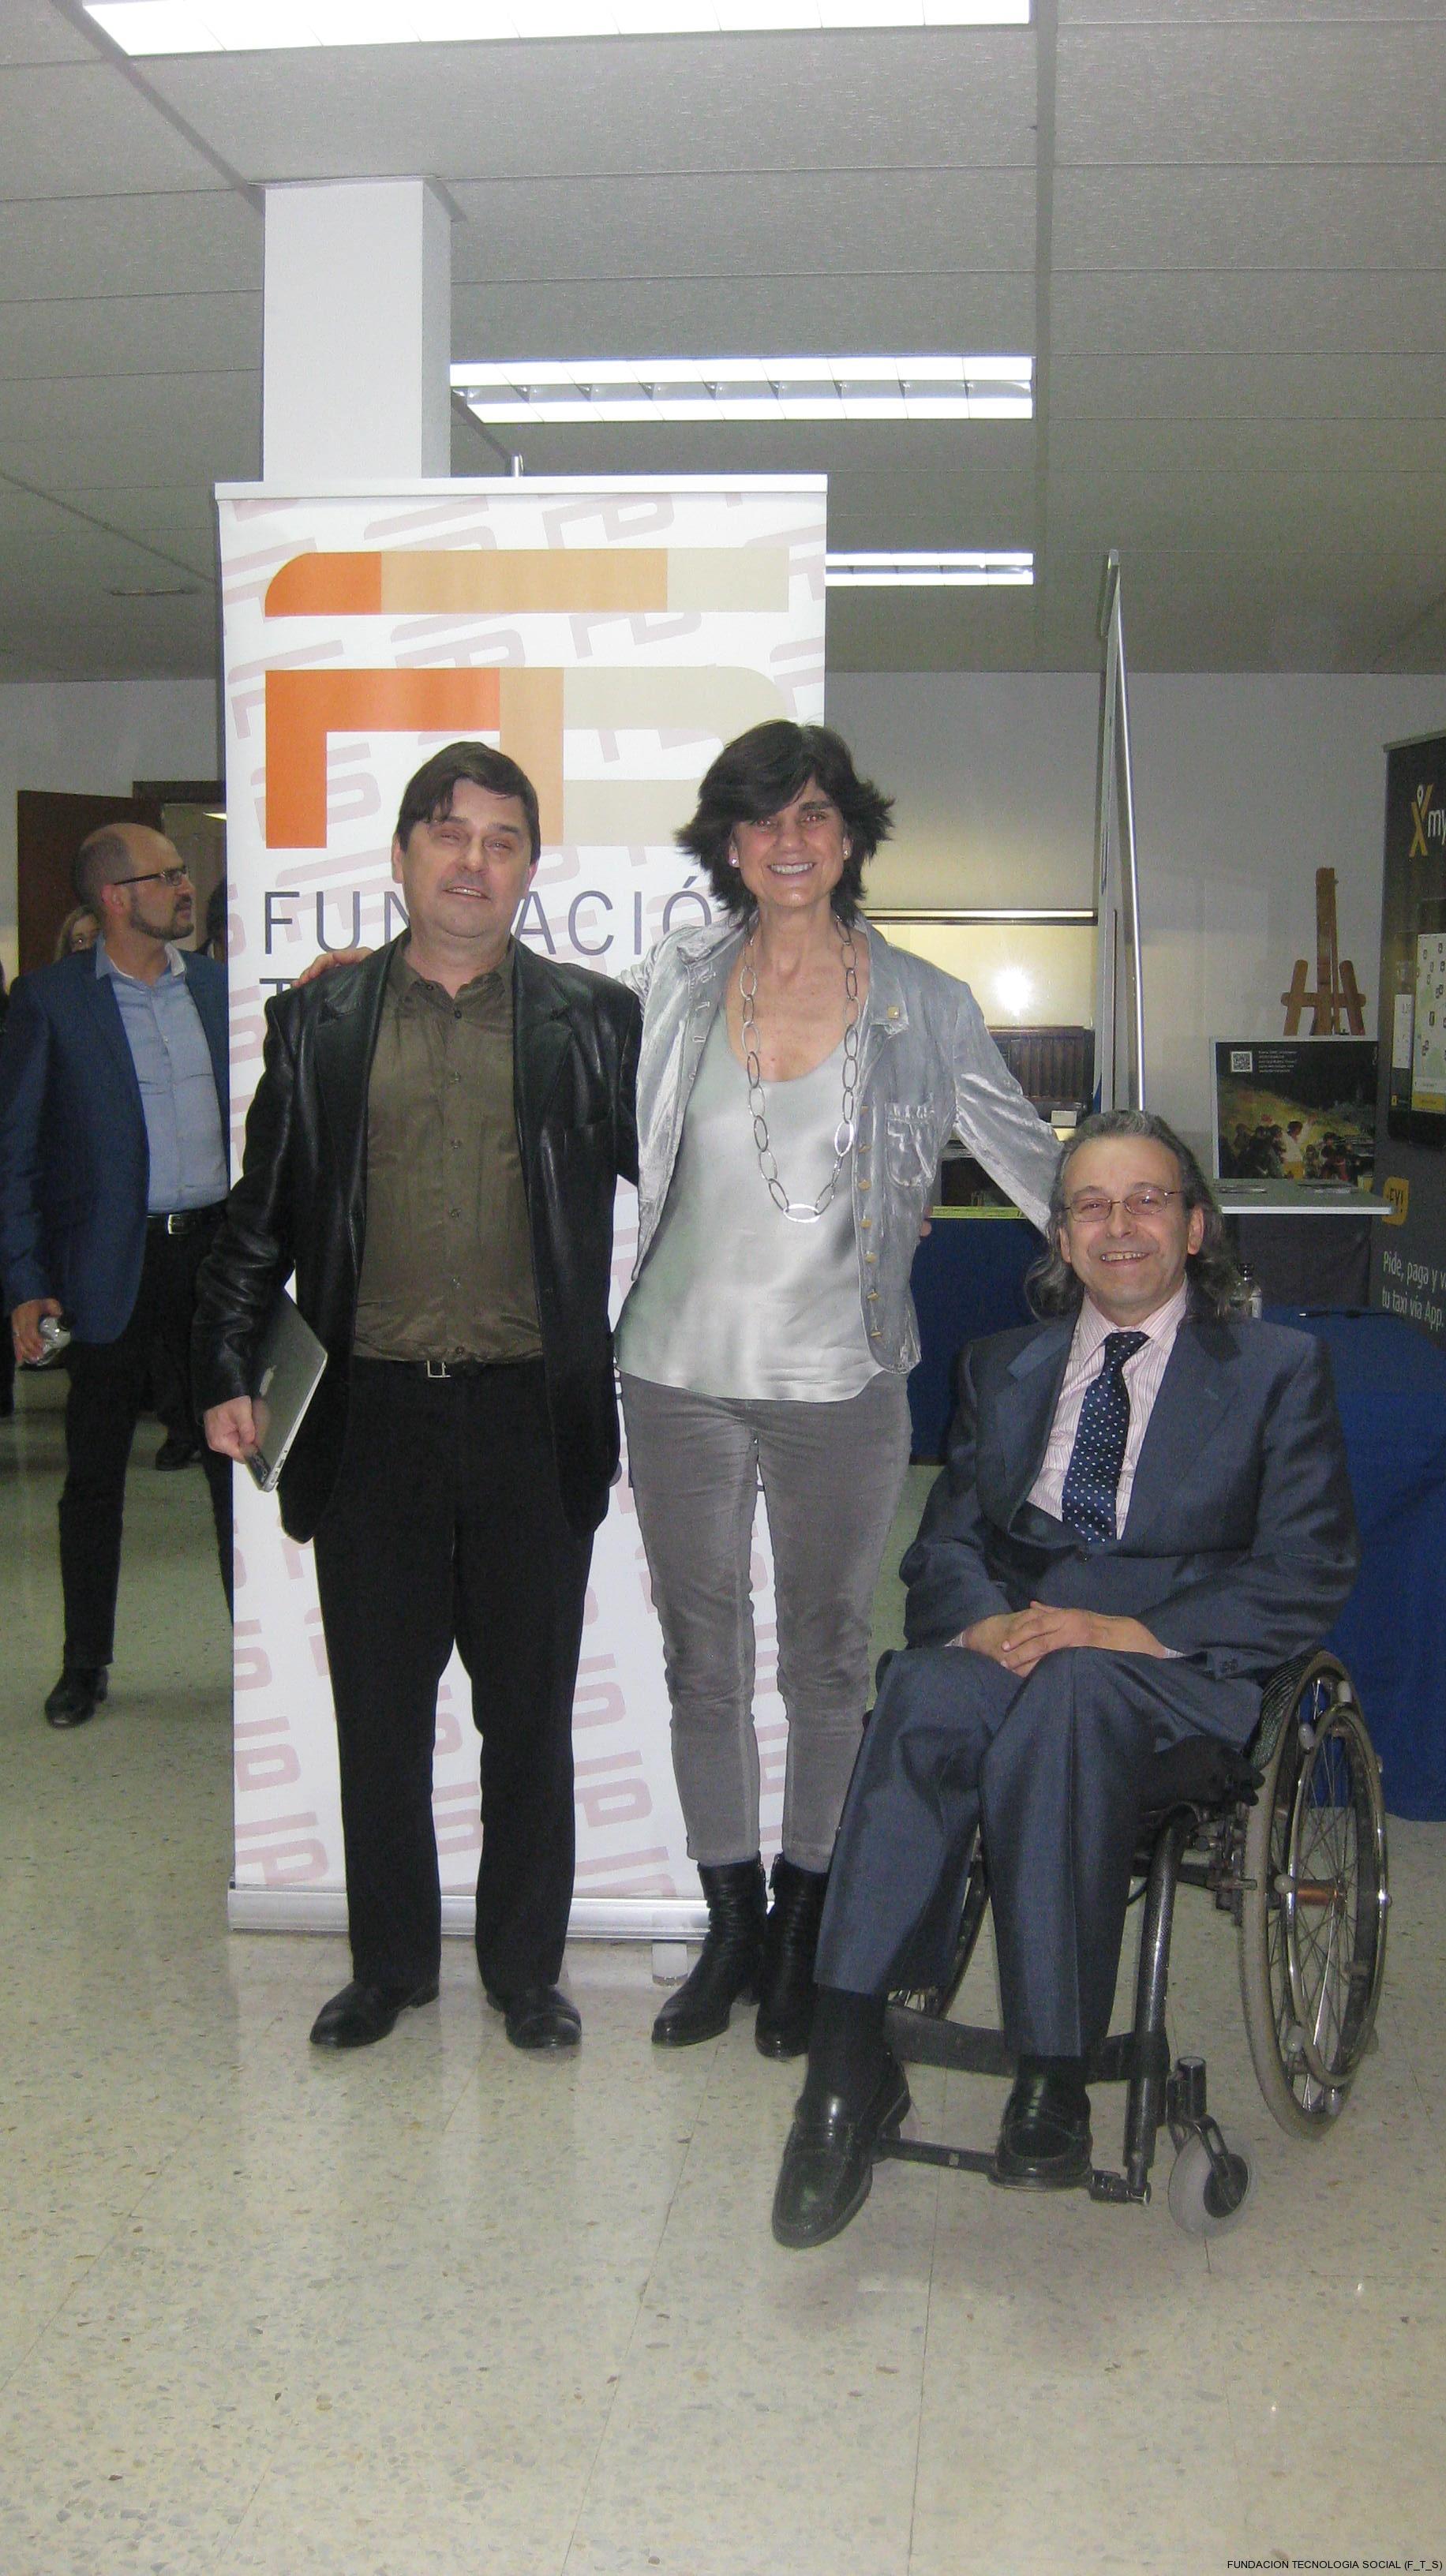 906-Maria-benjumea-Enrique-Varela-JuanC-Ramiro.jpg